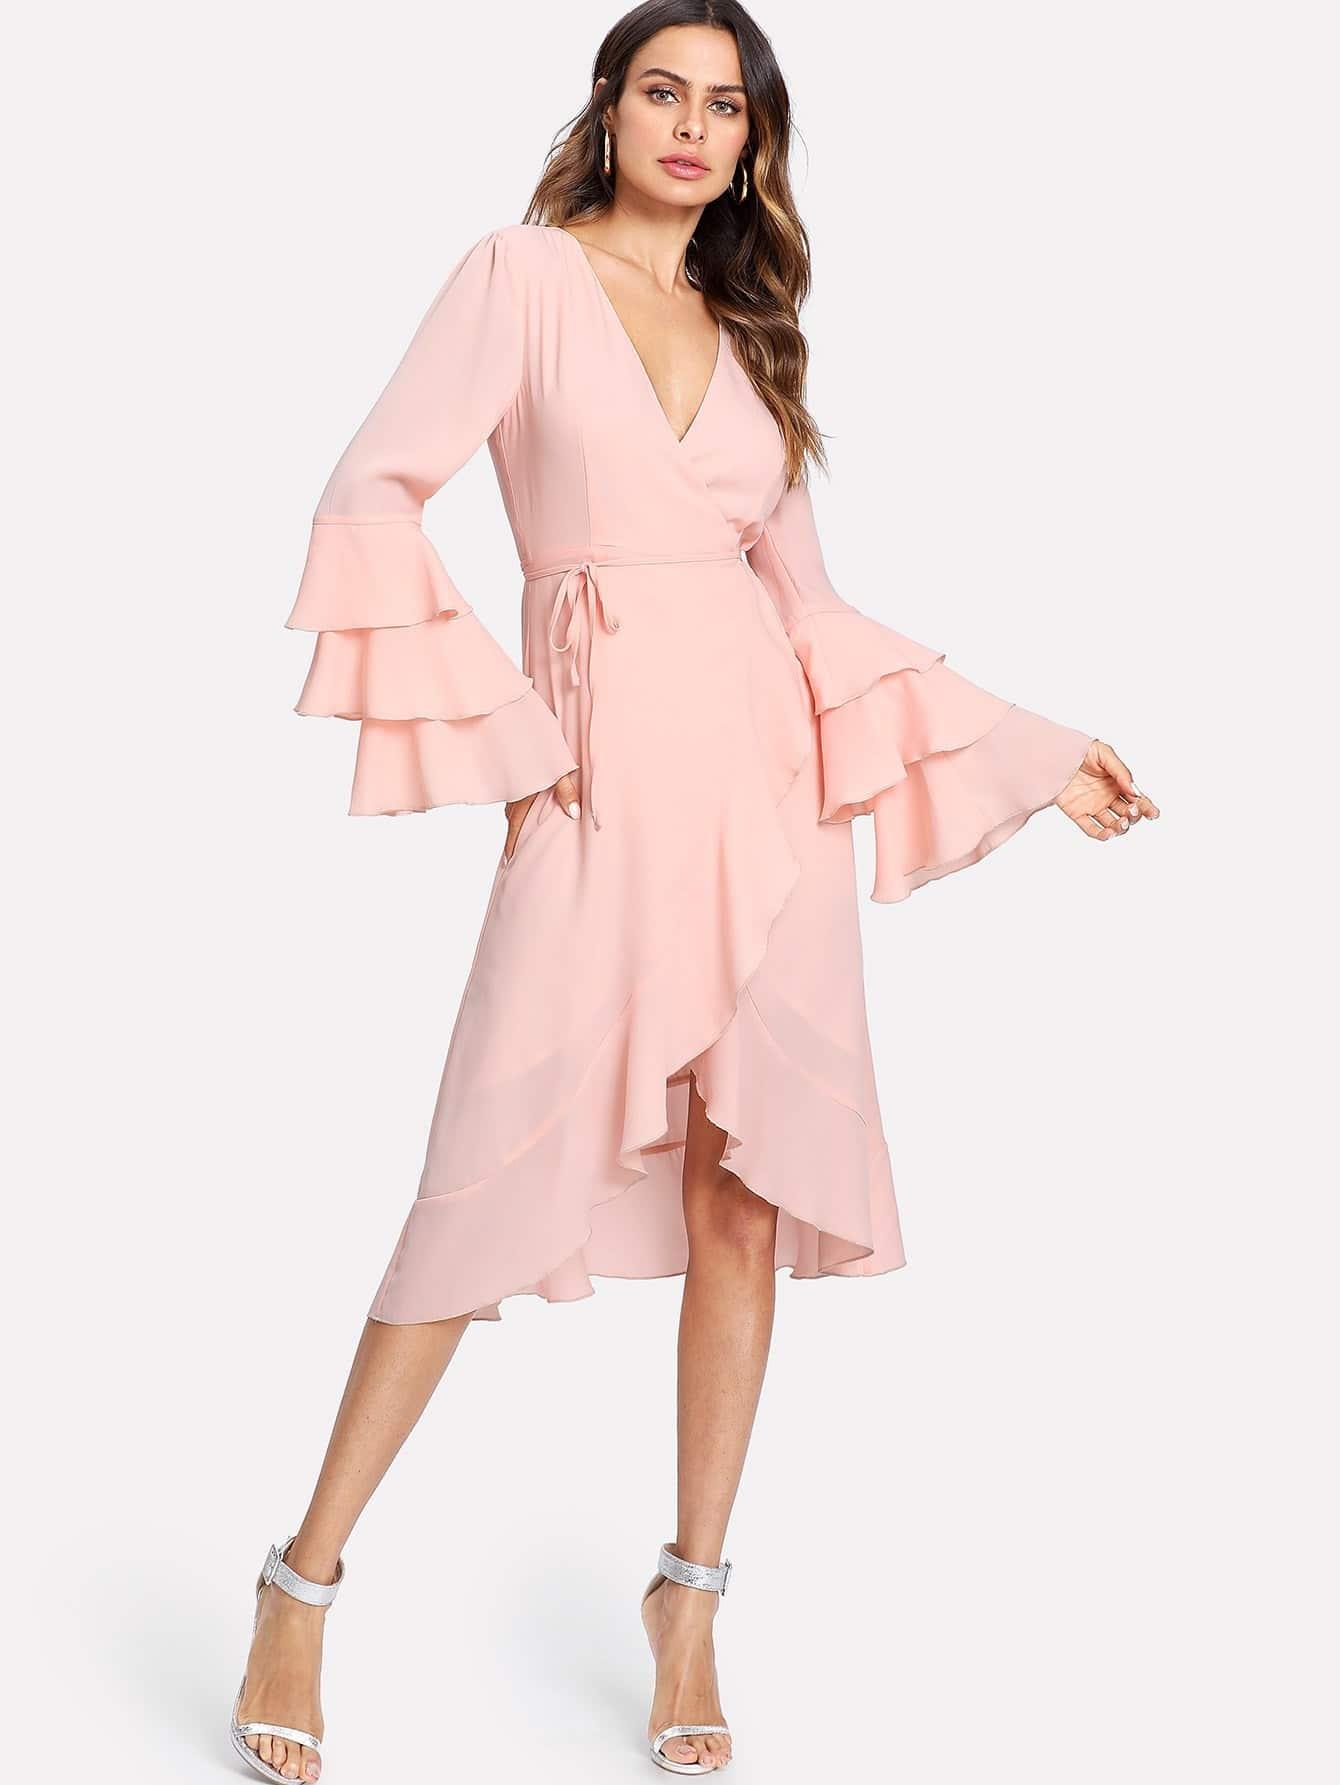 Layered Sleeve Surplice Wrap Ruffle Dress layered frill sleeve surplice wrap top